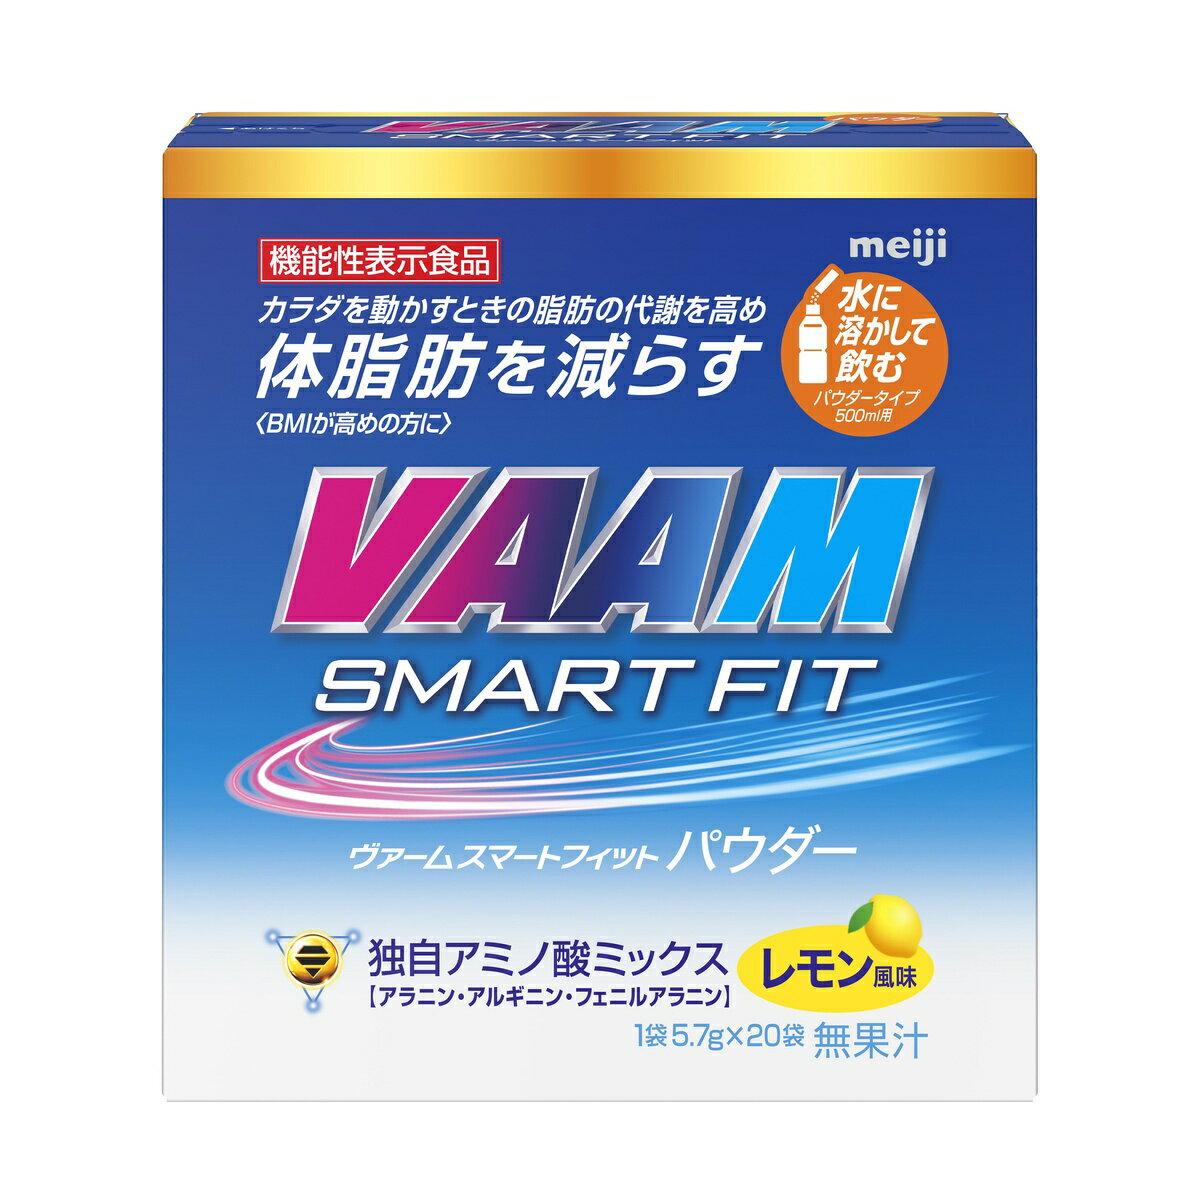 VAAM (ヴァーム) フィットネス 健康 ドリンク VAAM WATER 500 2650012